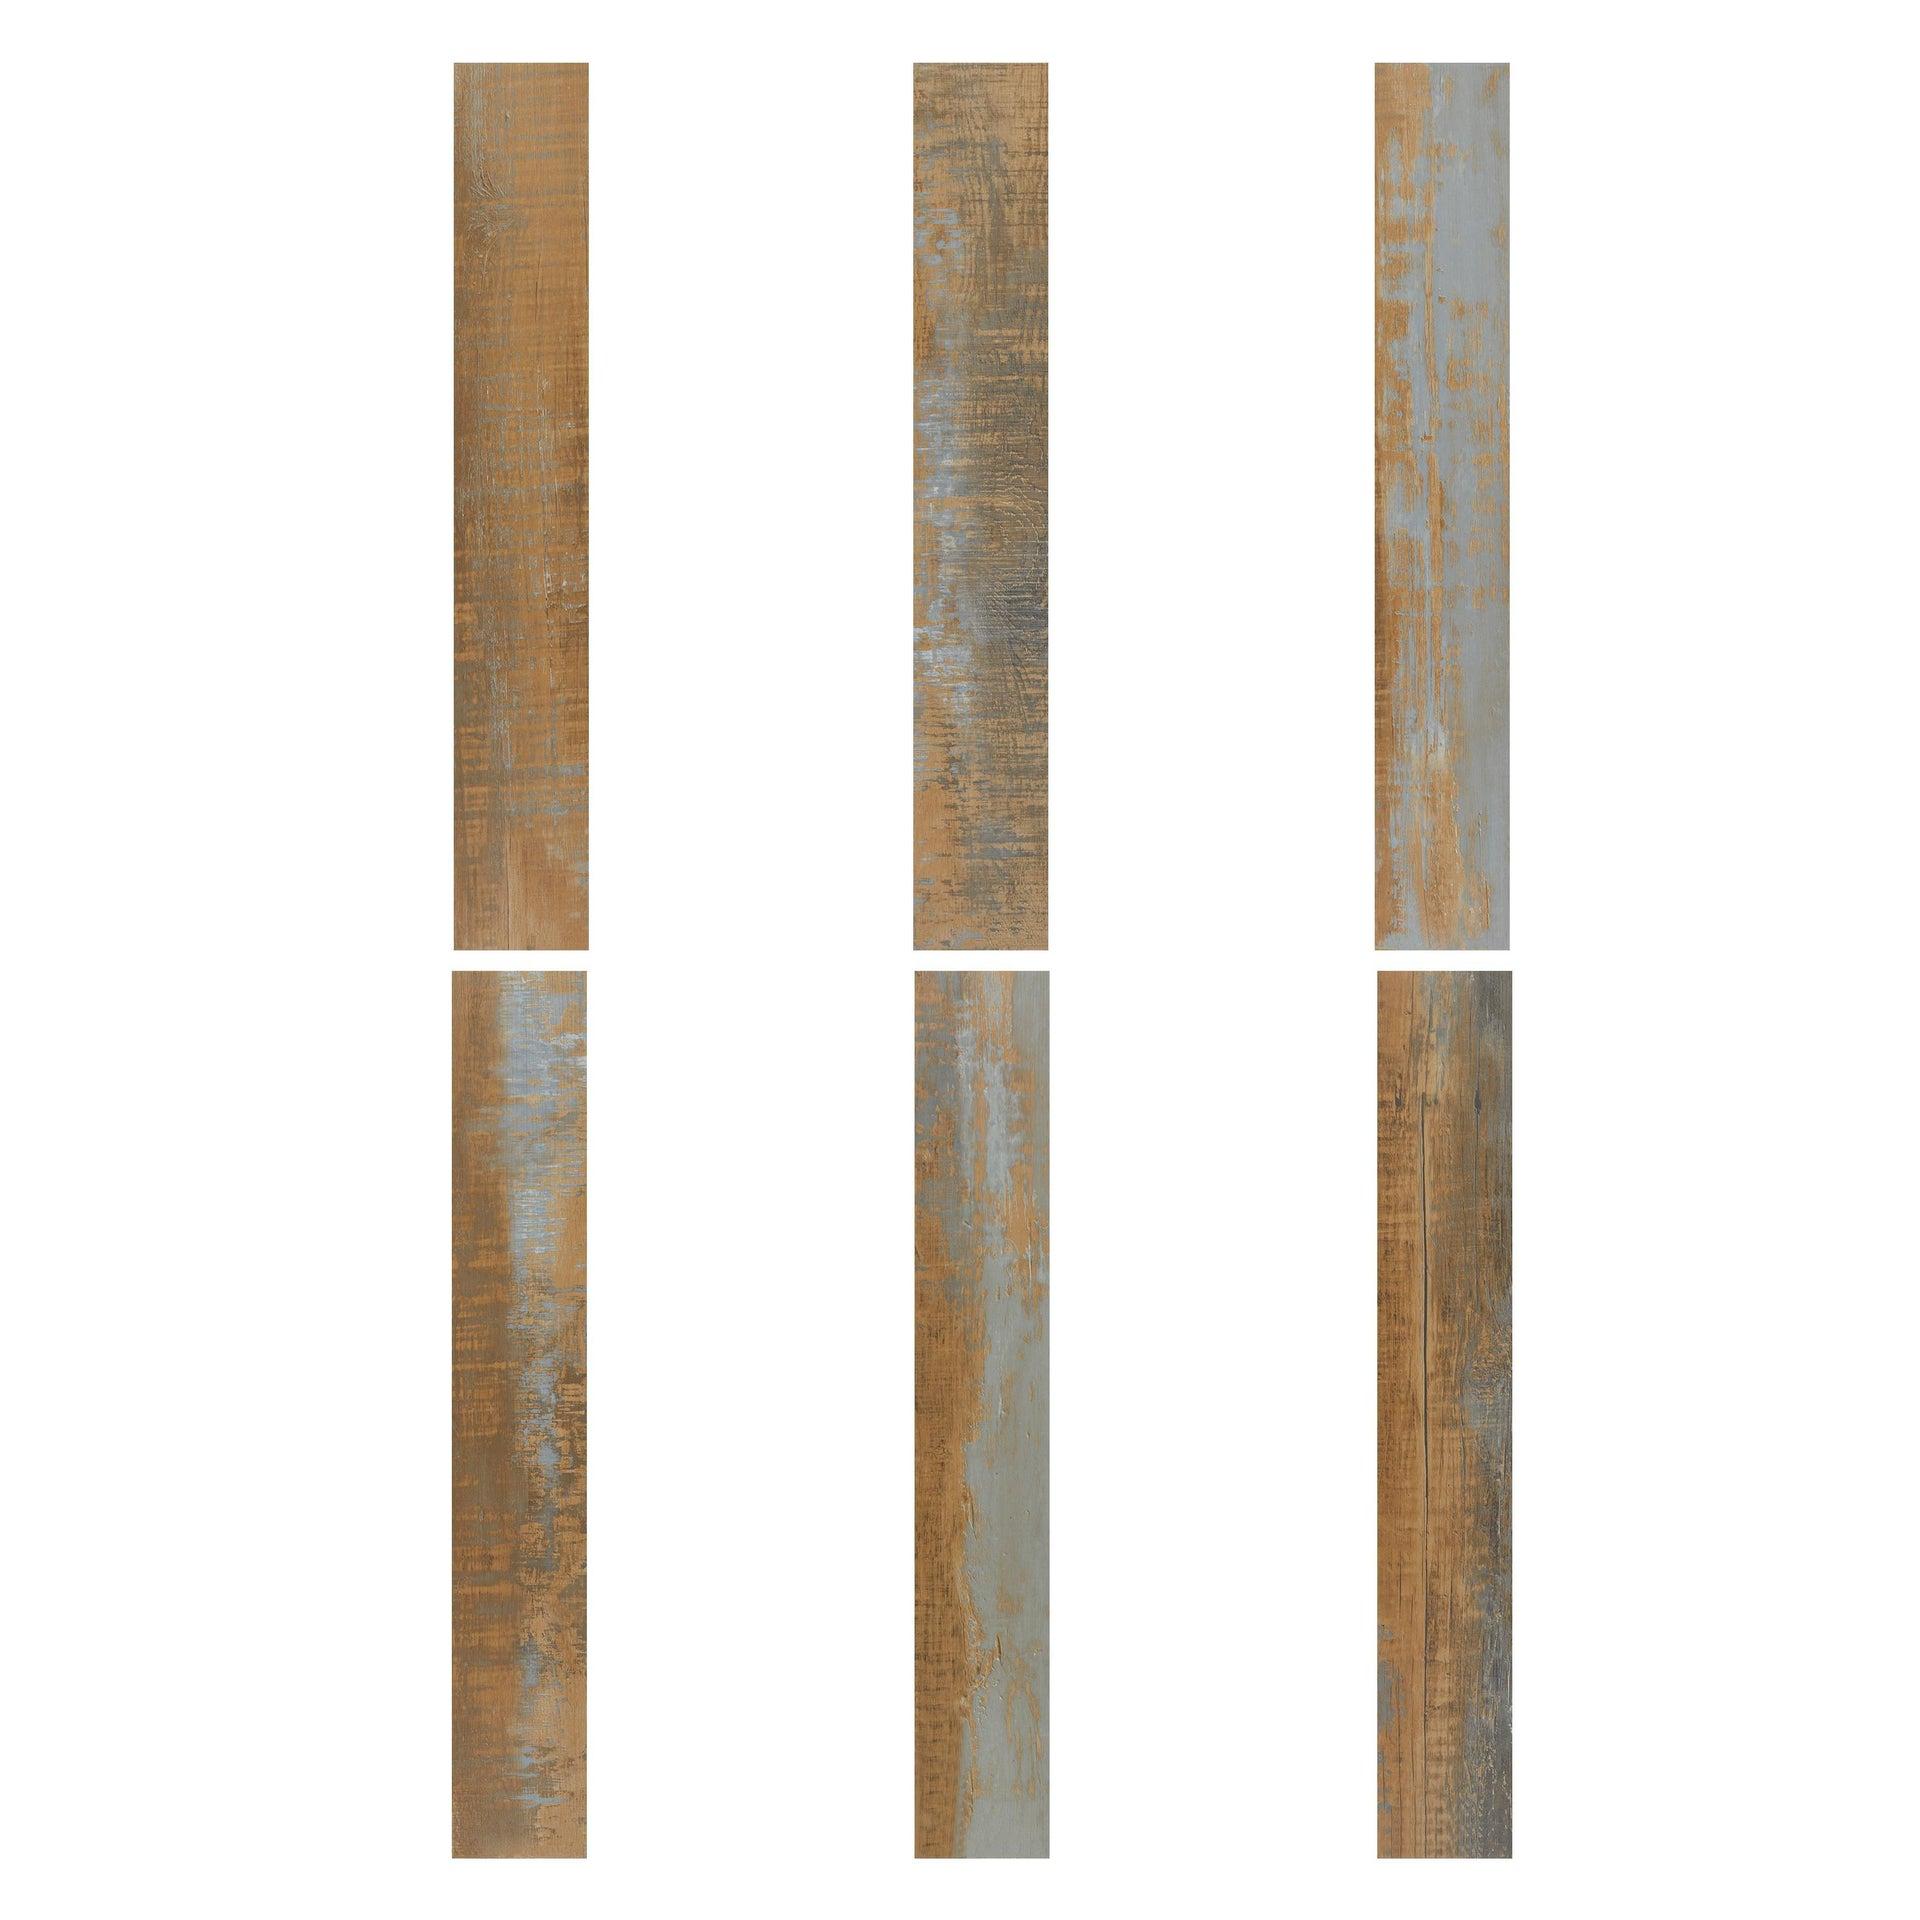 Pavimento PVC adesivo Mungo Sp 2 mm giallo / dorato - 2